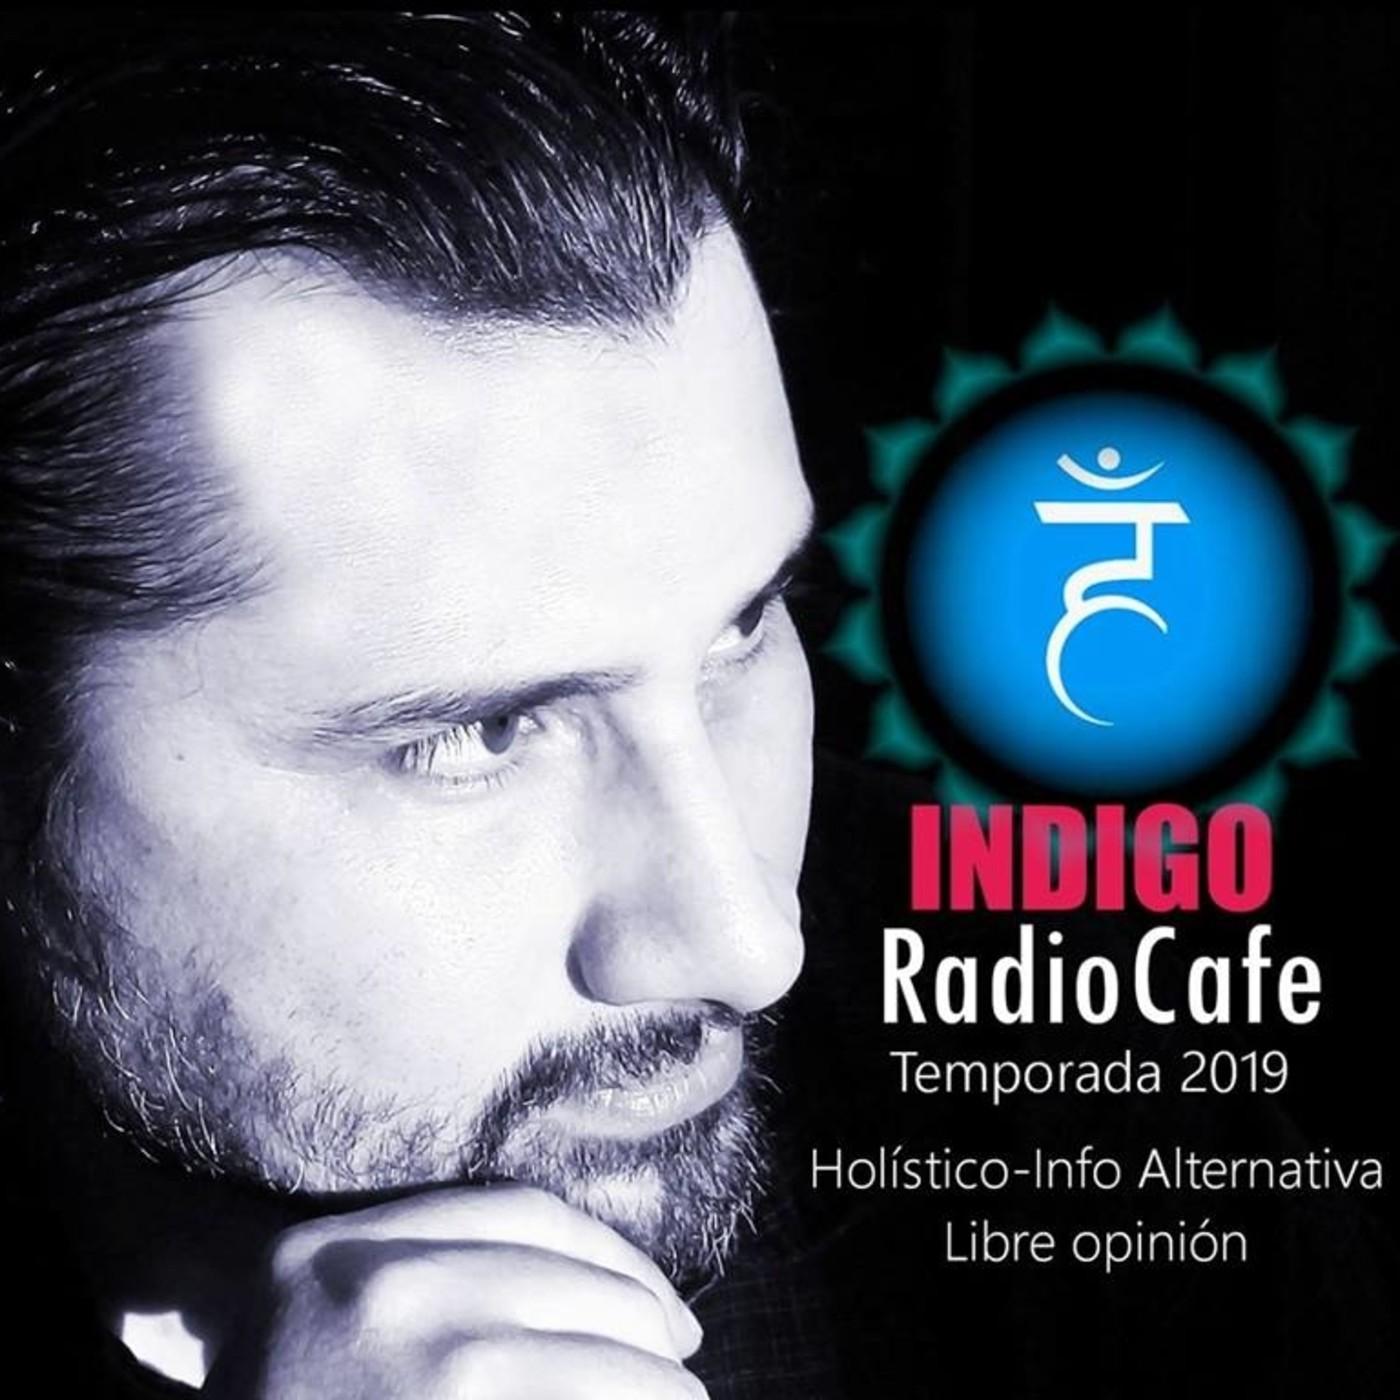 Indigo Radio Cafe (portal)